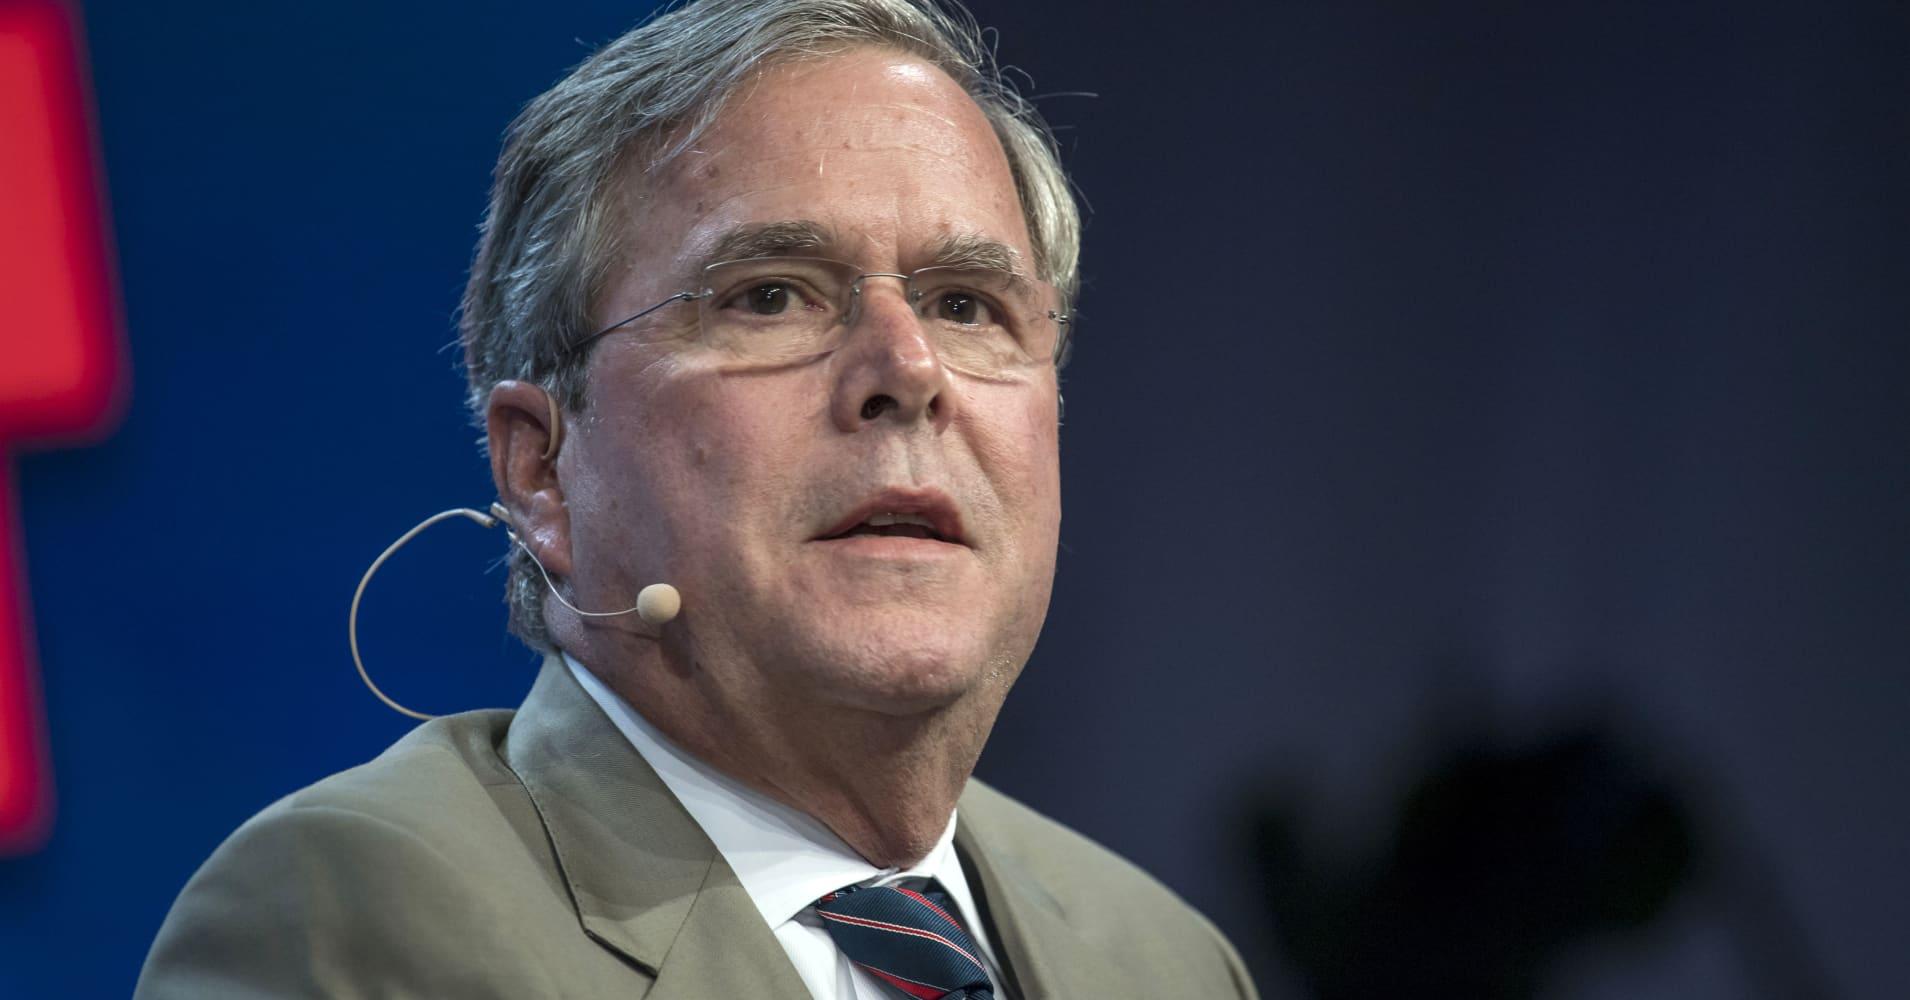 Jeb Bush Quotes Watch Jeb Bush Speak